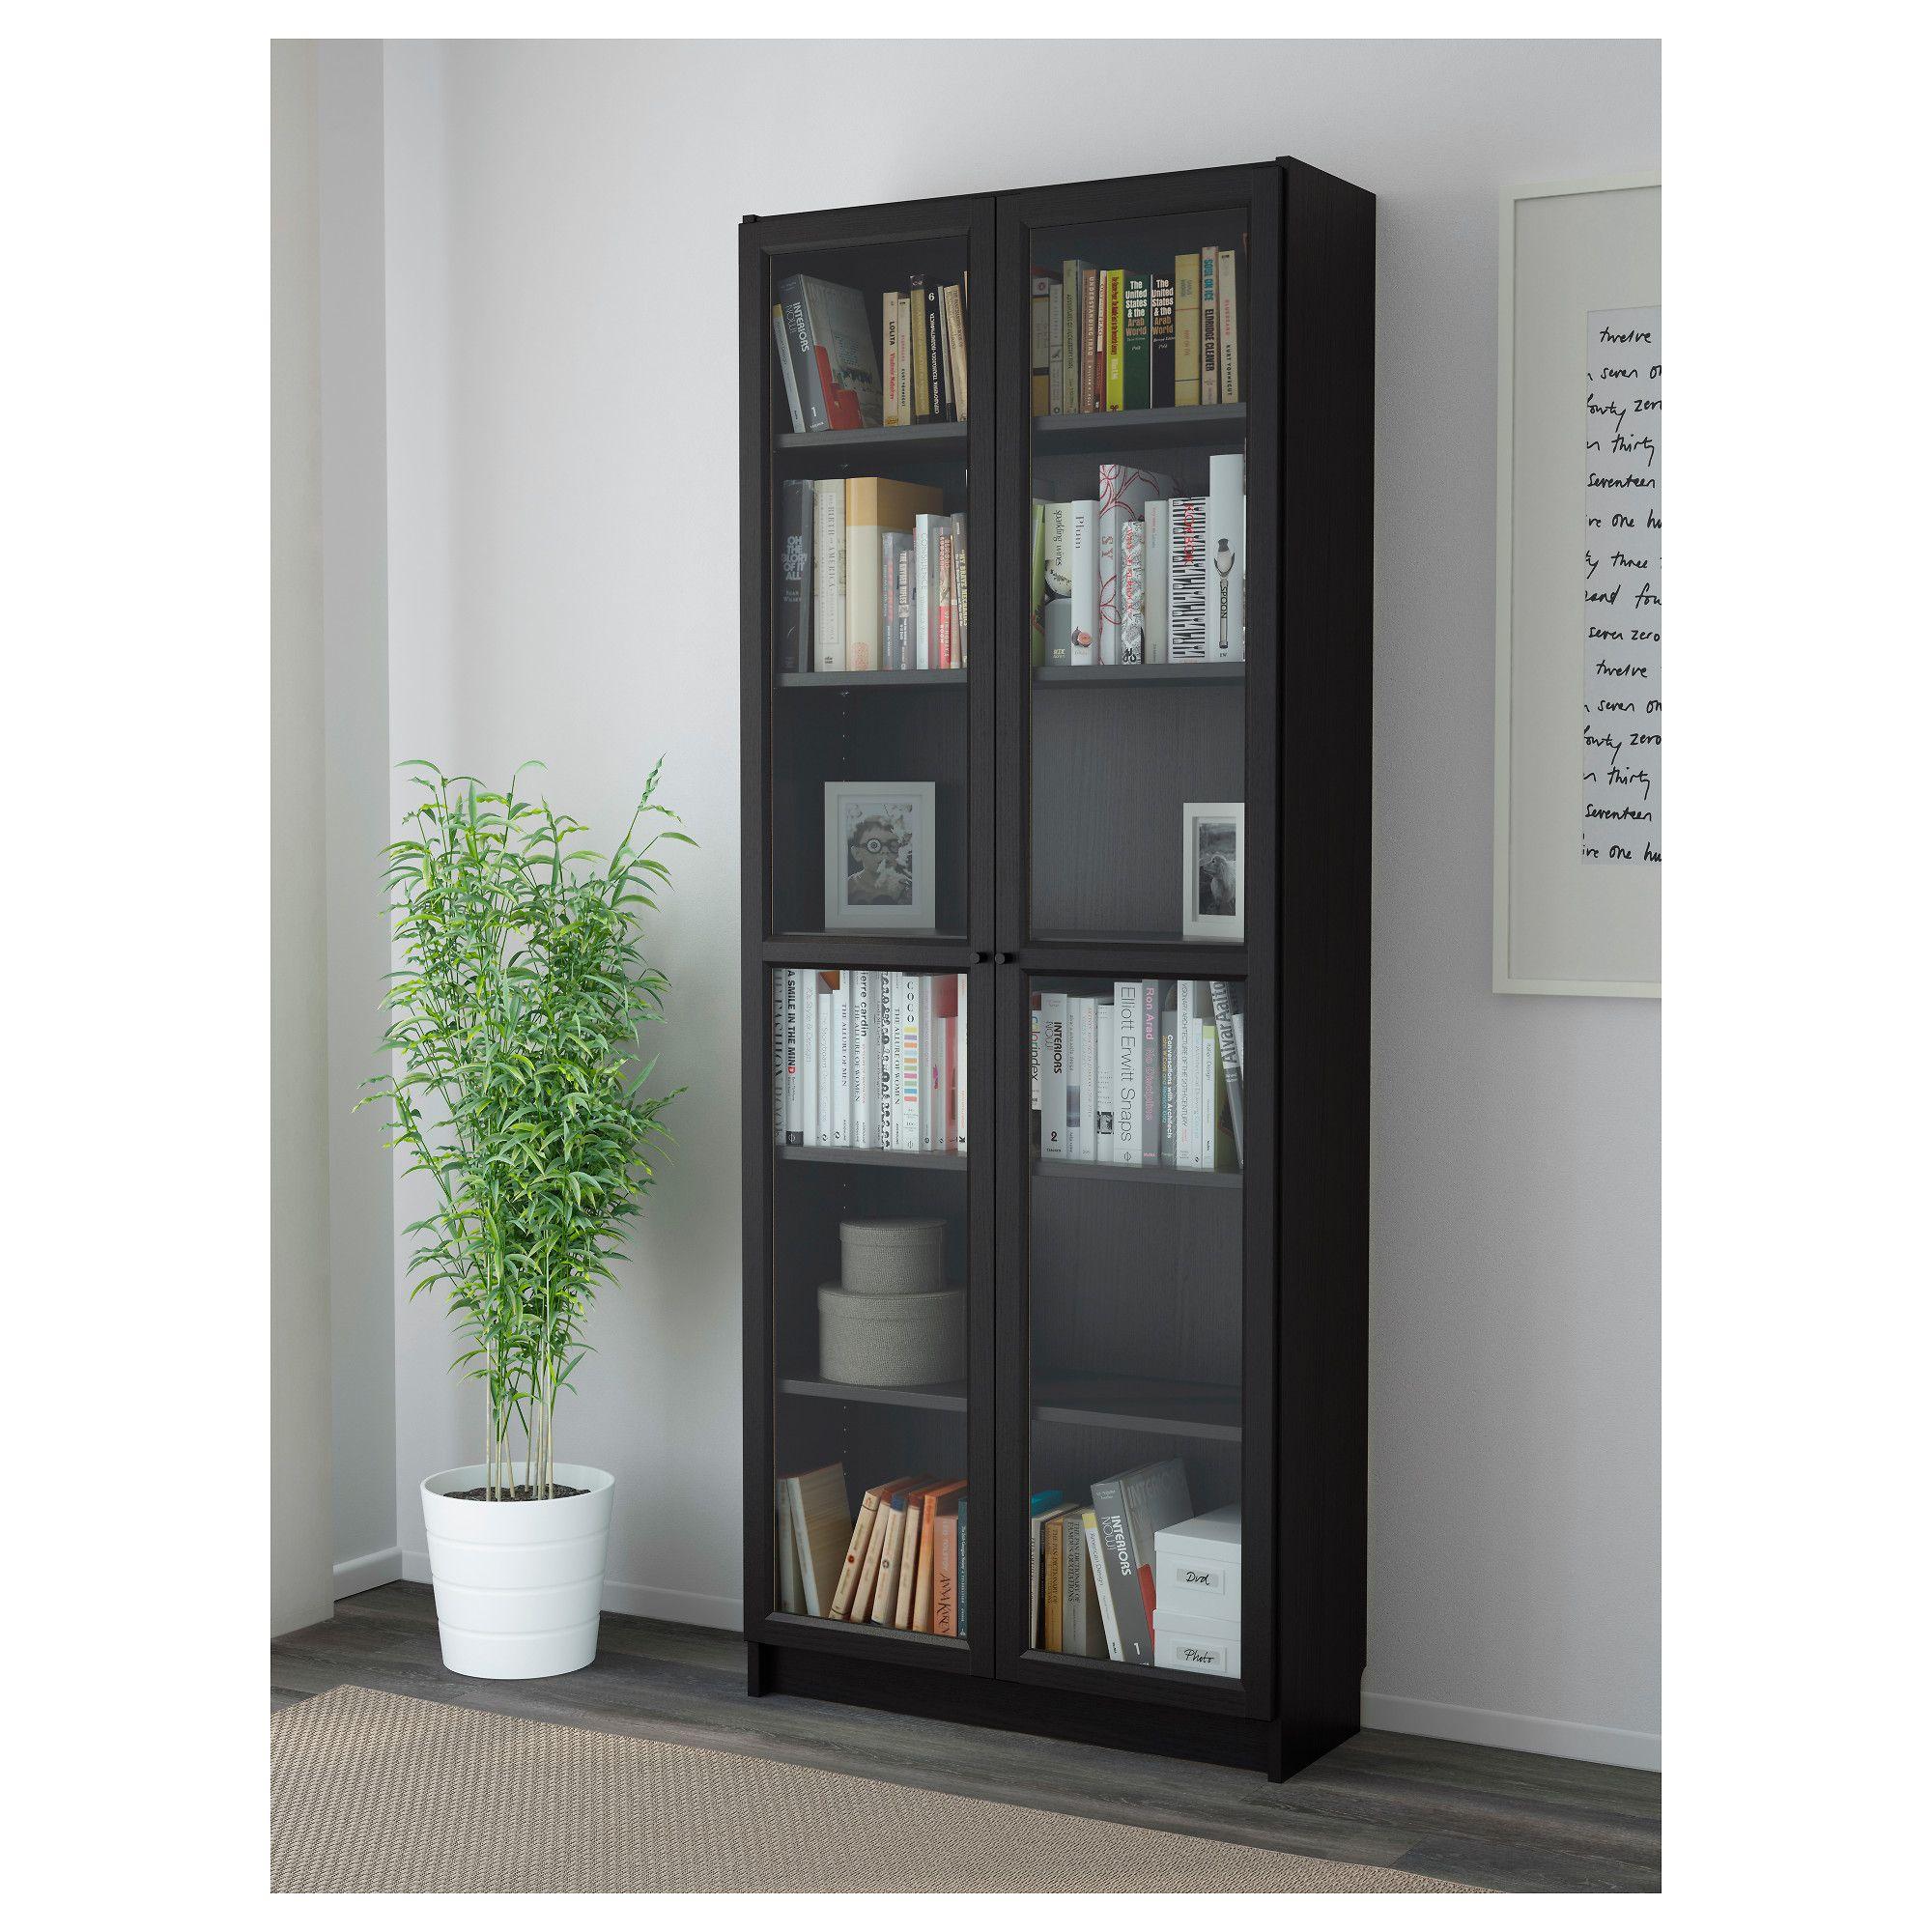 Ikea Billy Oxberg Bookcase Black Brown In 2019